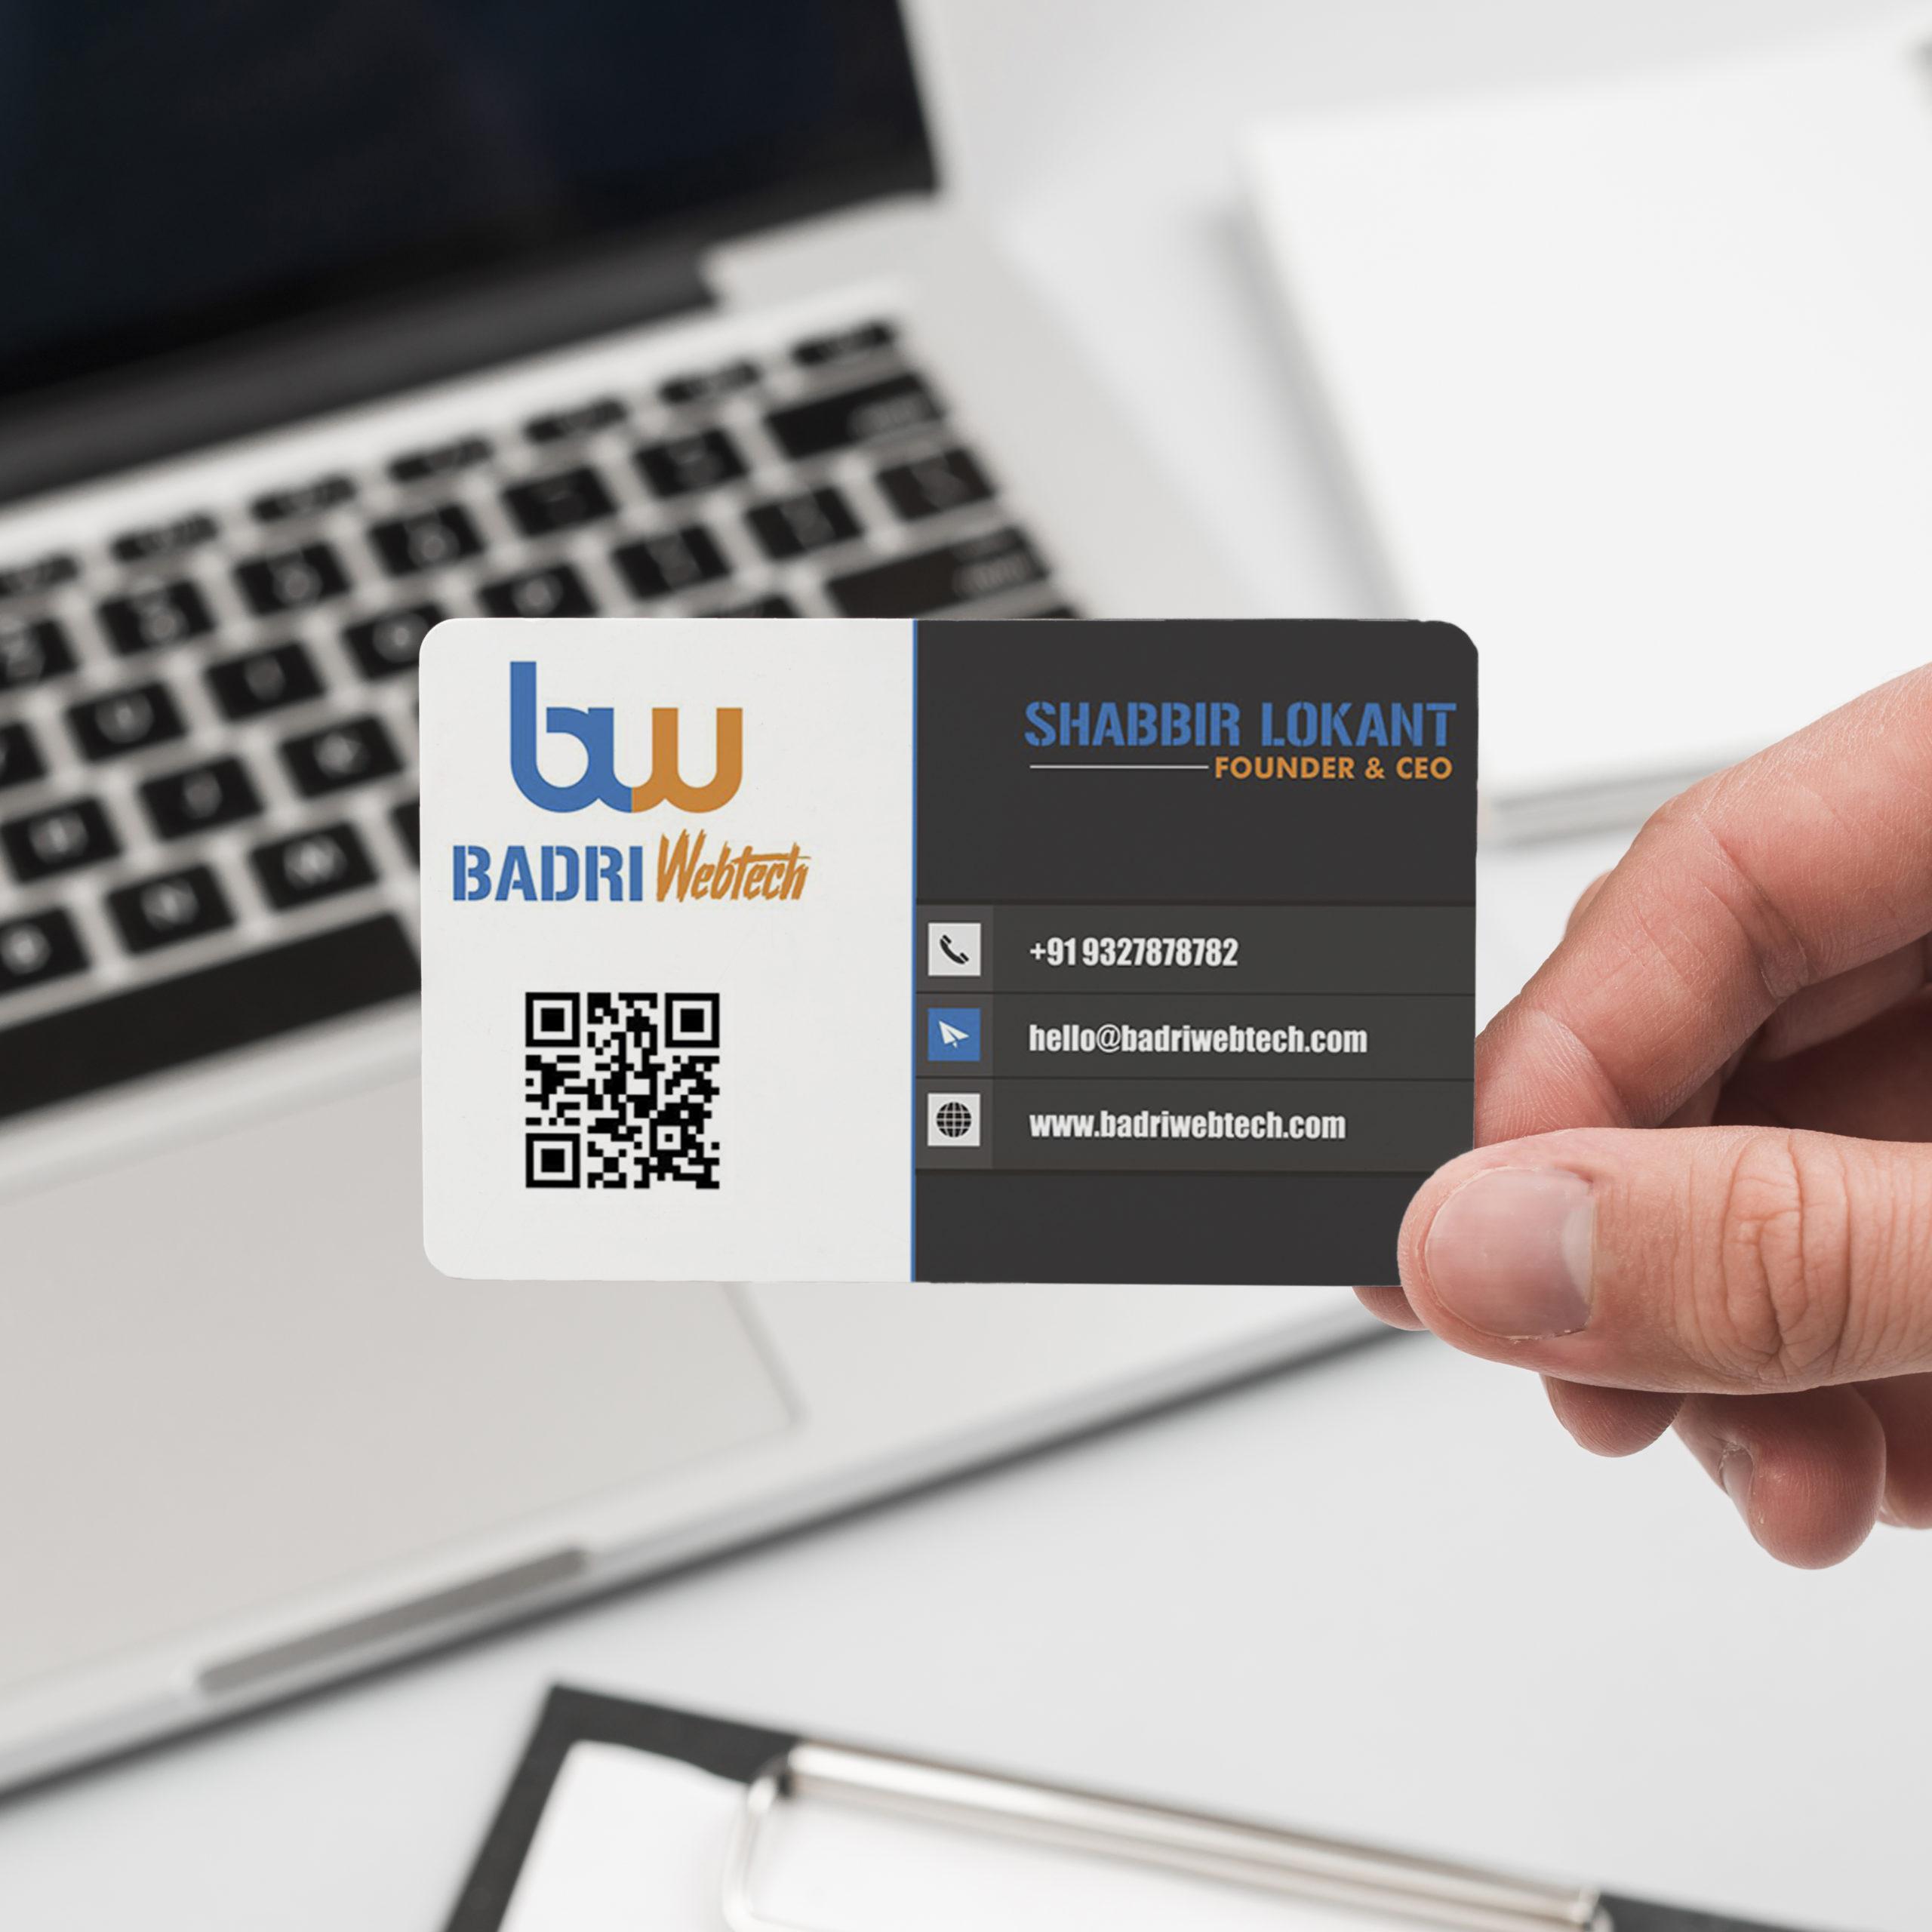 Webtech comany business card design by Badri Design